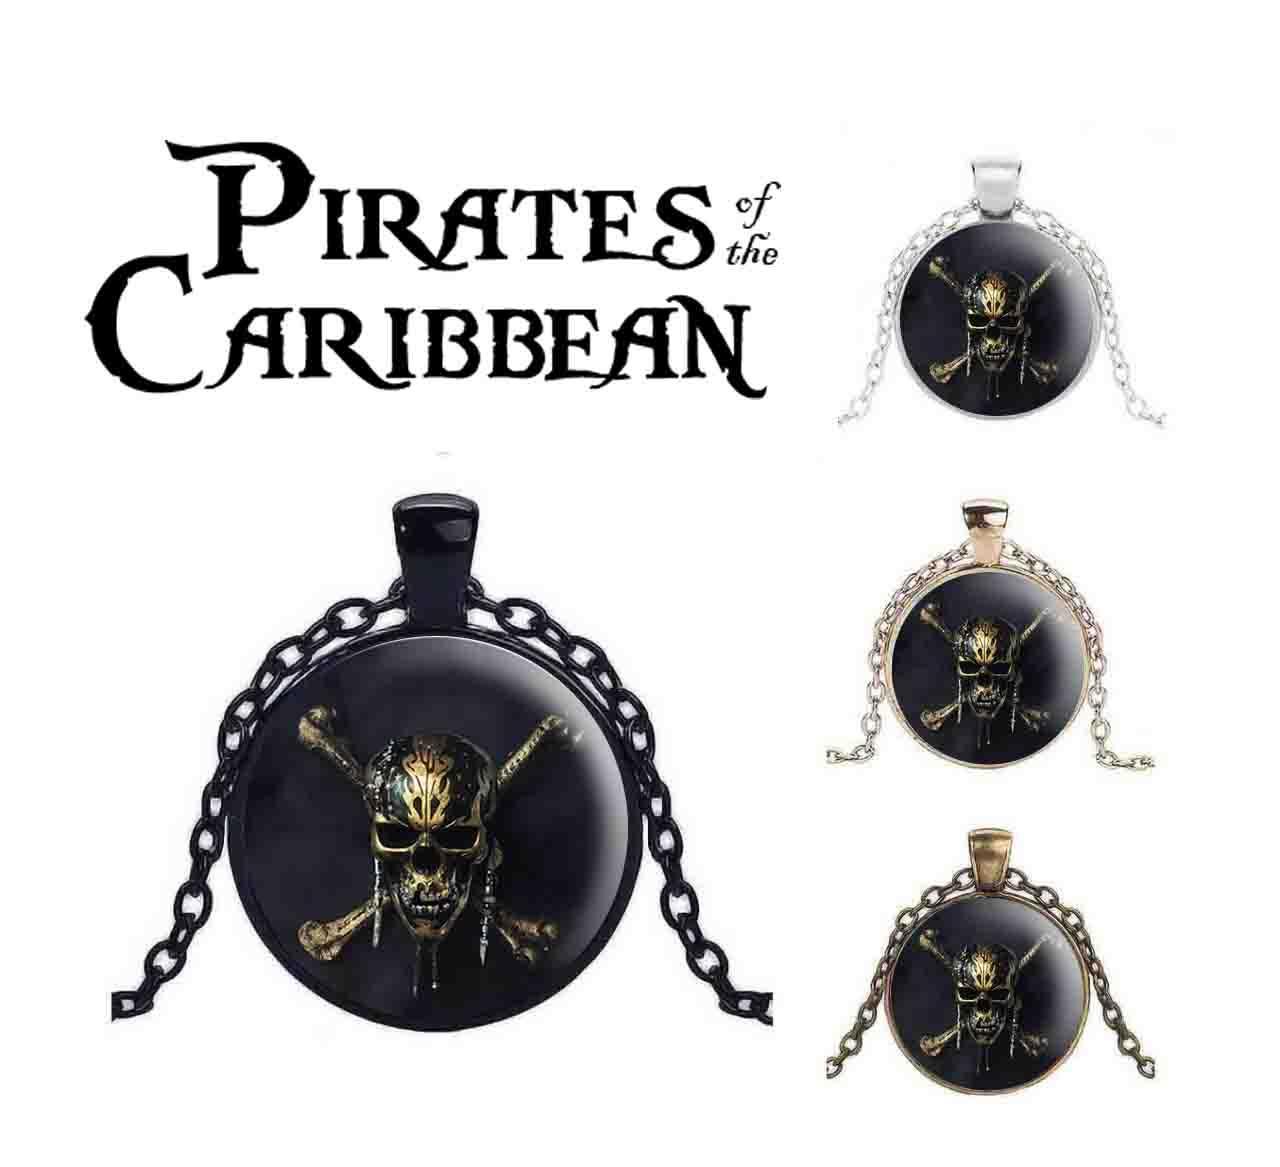 Кулон Пираты Карибского моря/Pirates of the Caribbean череп с костями